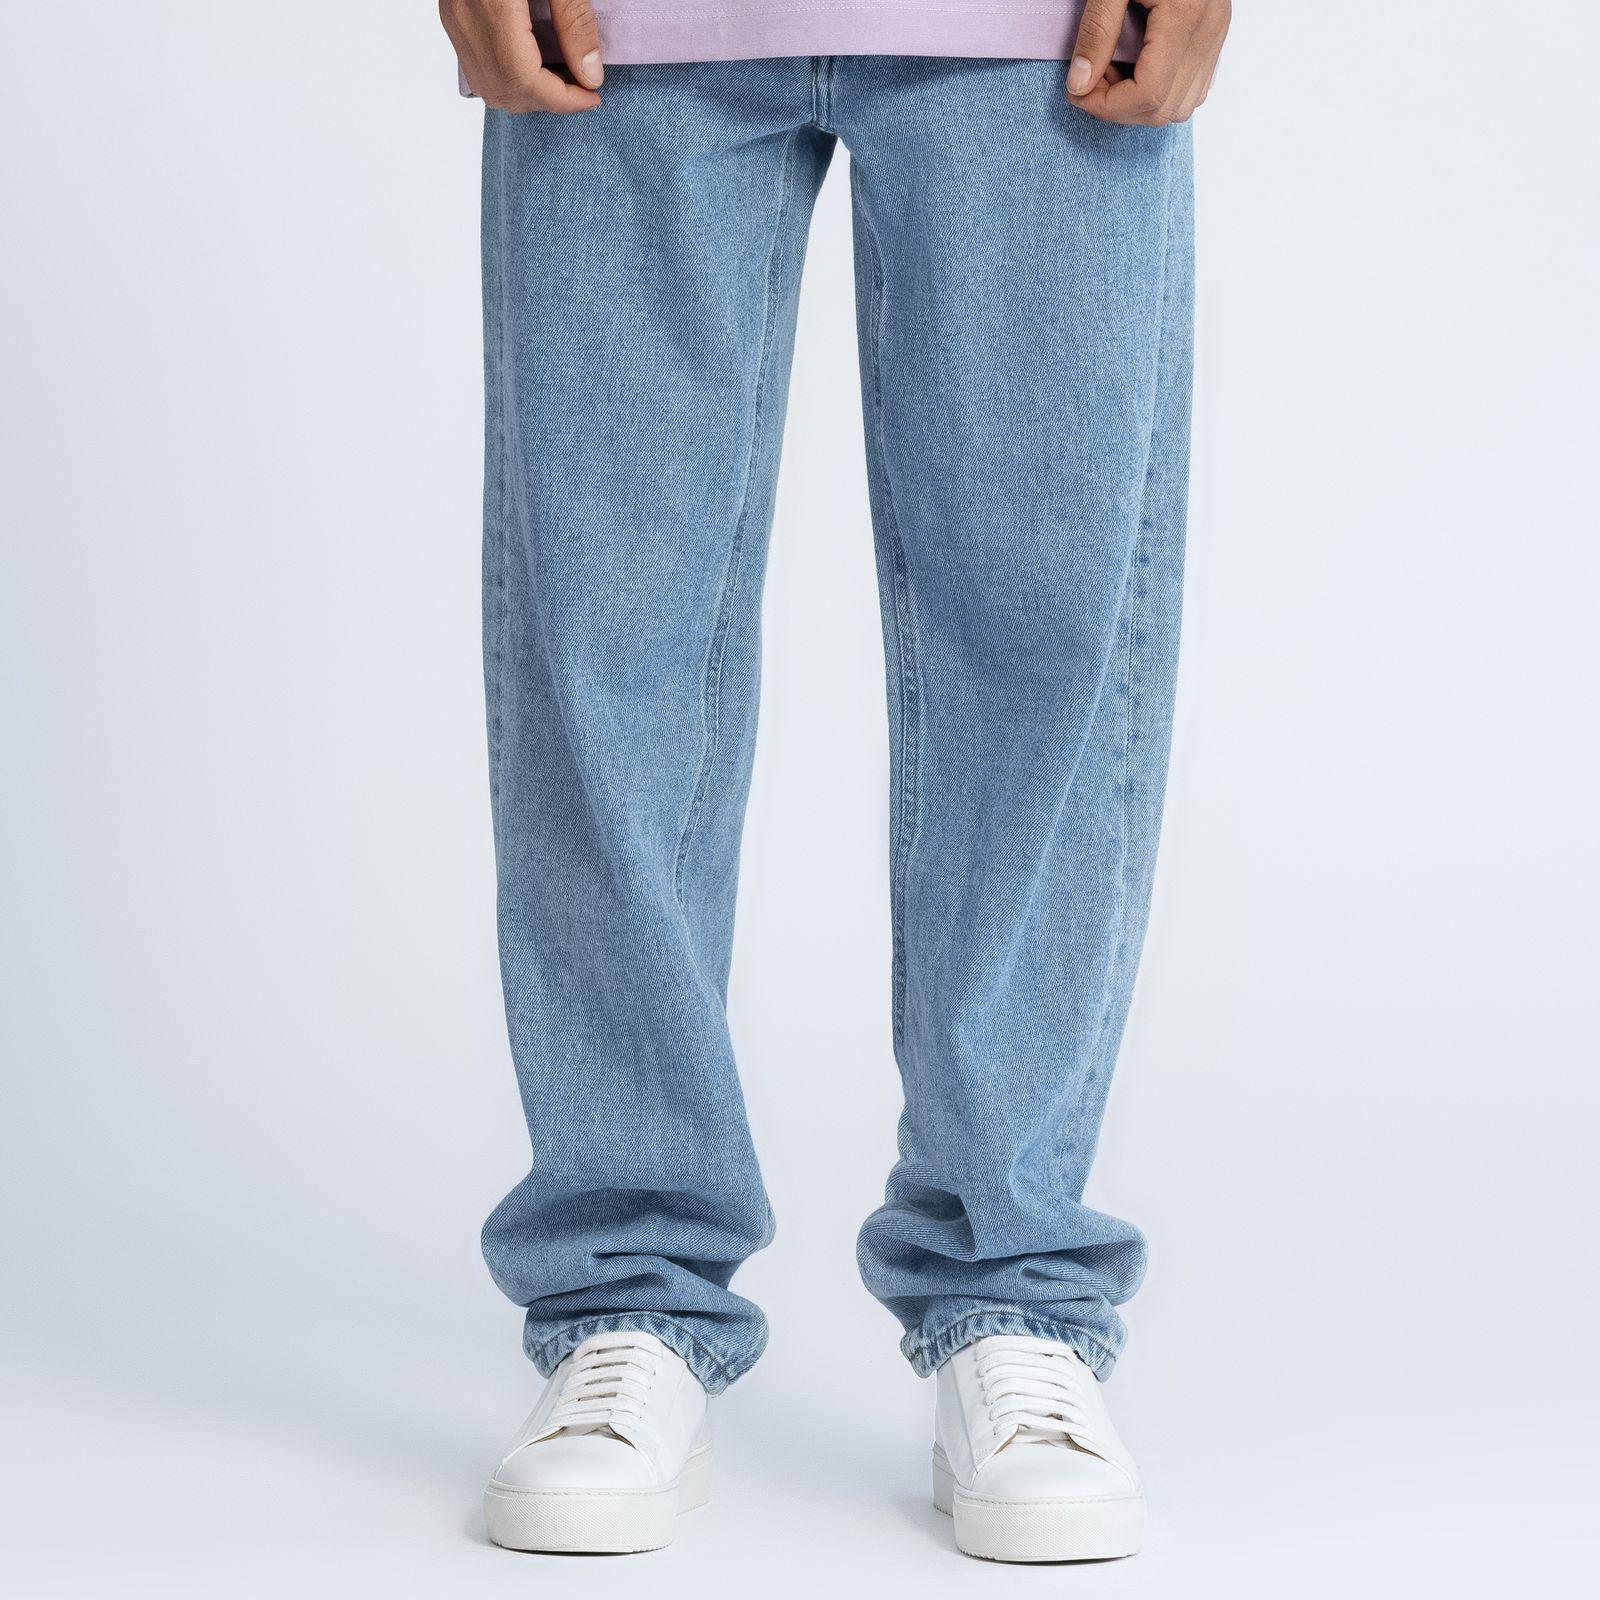 شلوار جین مردانه کوی مدل دایی رنگ آبی روشن -  - 2